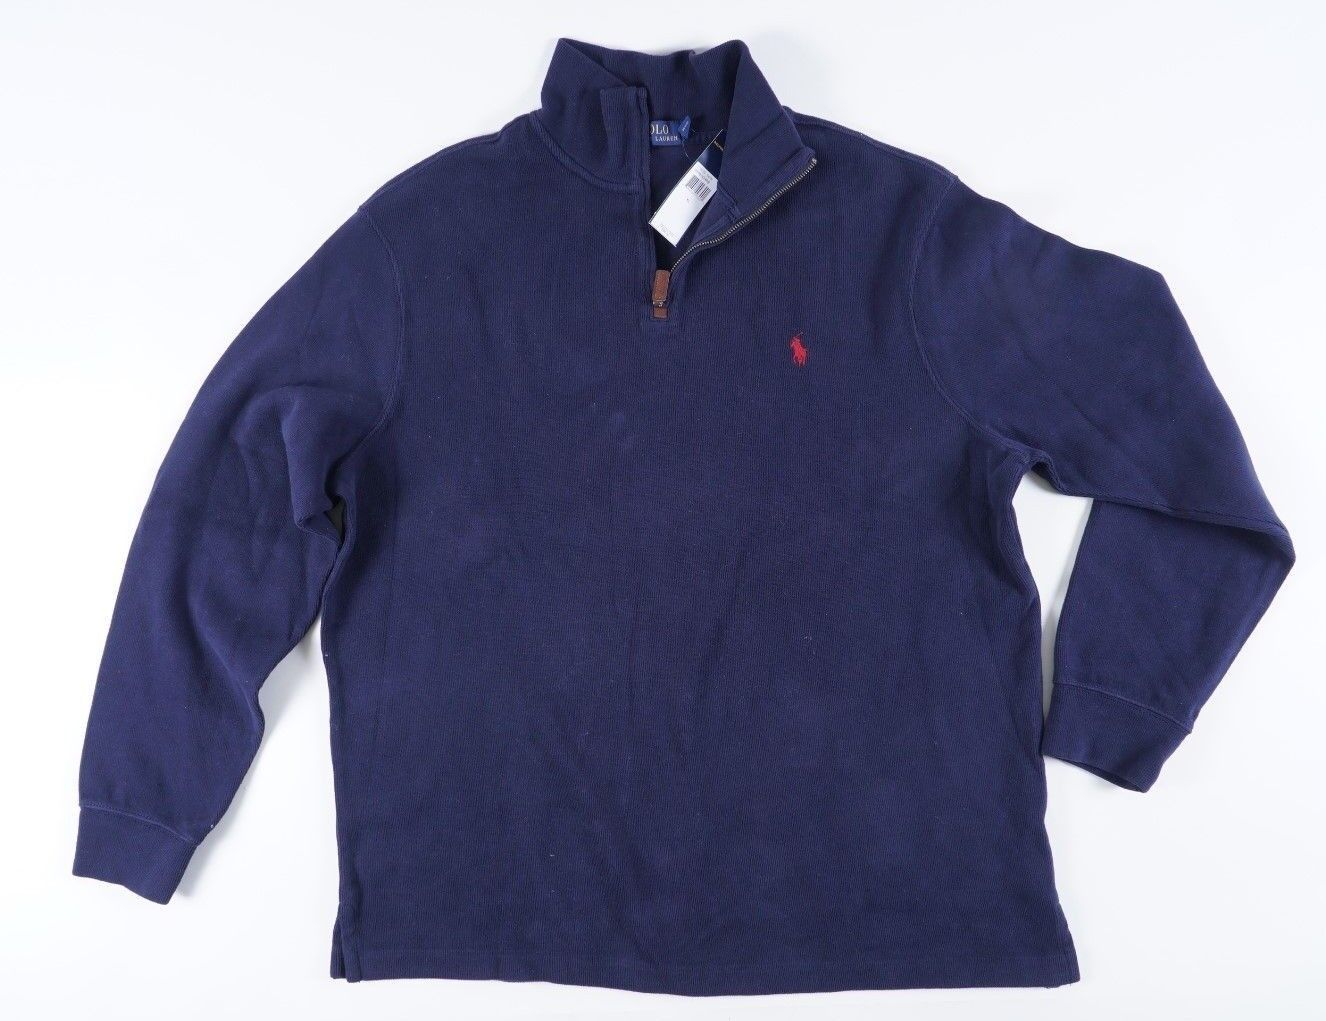 06fcb803 Polo Ralph Lauren XL bluee Ribbed Knit Cotton 1 Zip Sweatshirt w Red Pony 2  Navy ncszxw1912-Sweaters